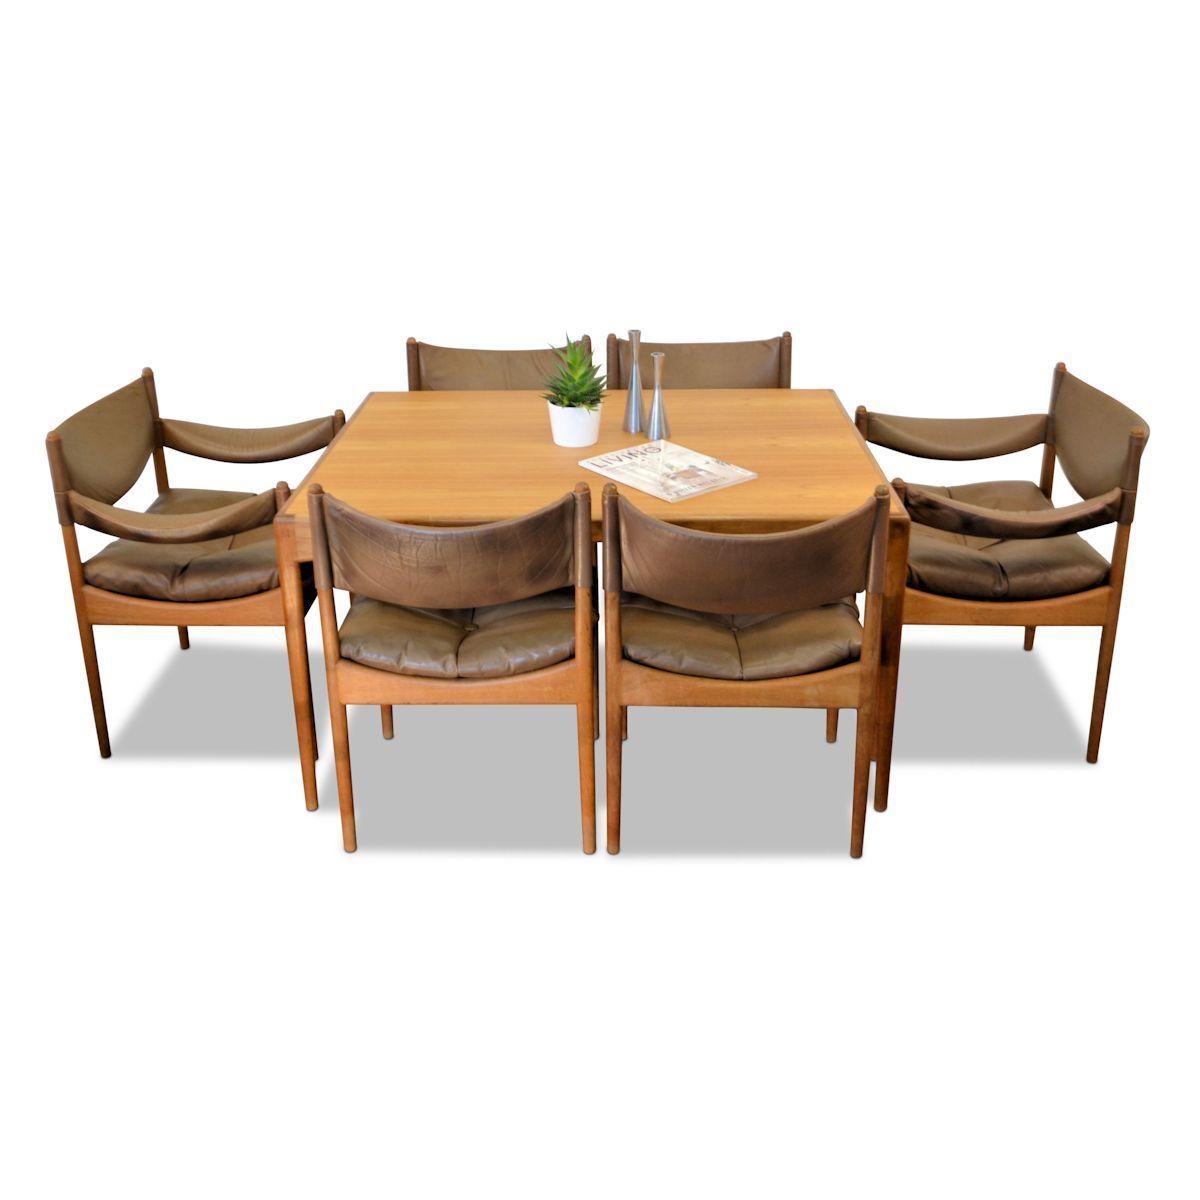 Vintage Danish Design Oak Dining Set By Kristian Vedel For Søren Willadsen  Møbelfabrik